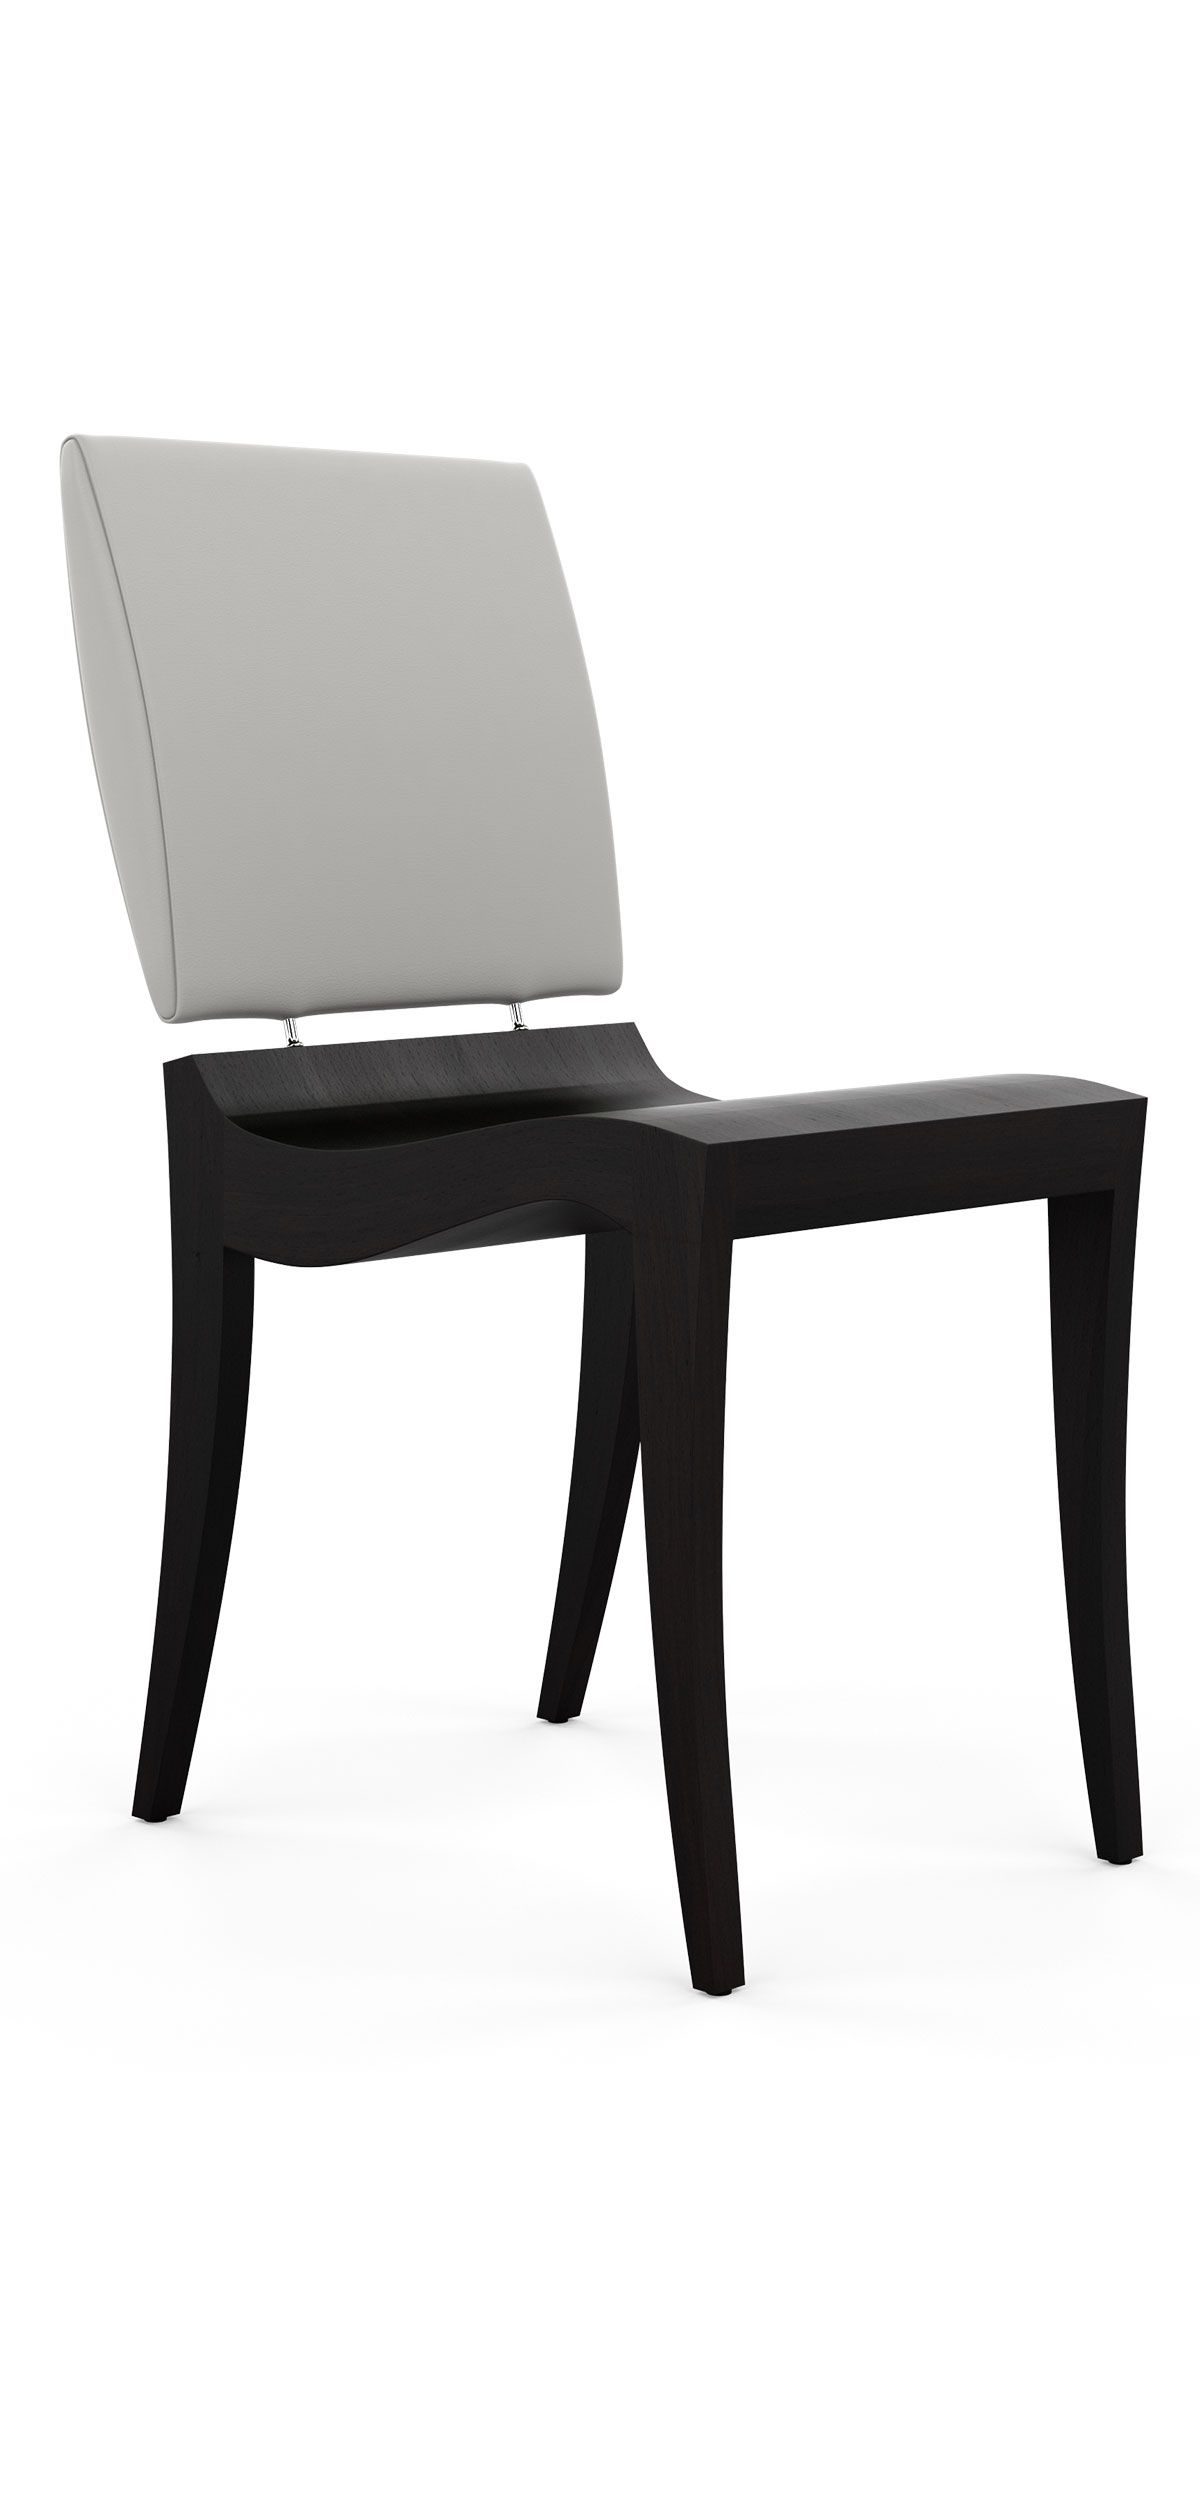 Finn Dining Chair Designed By Thibault Desombre For Ligne Roset